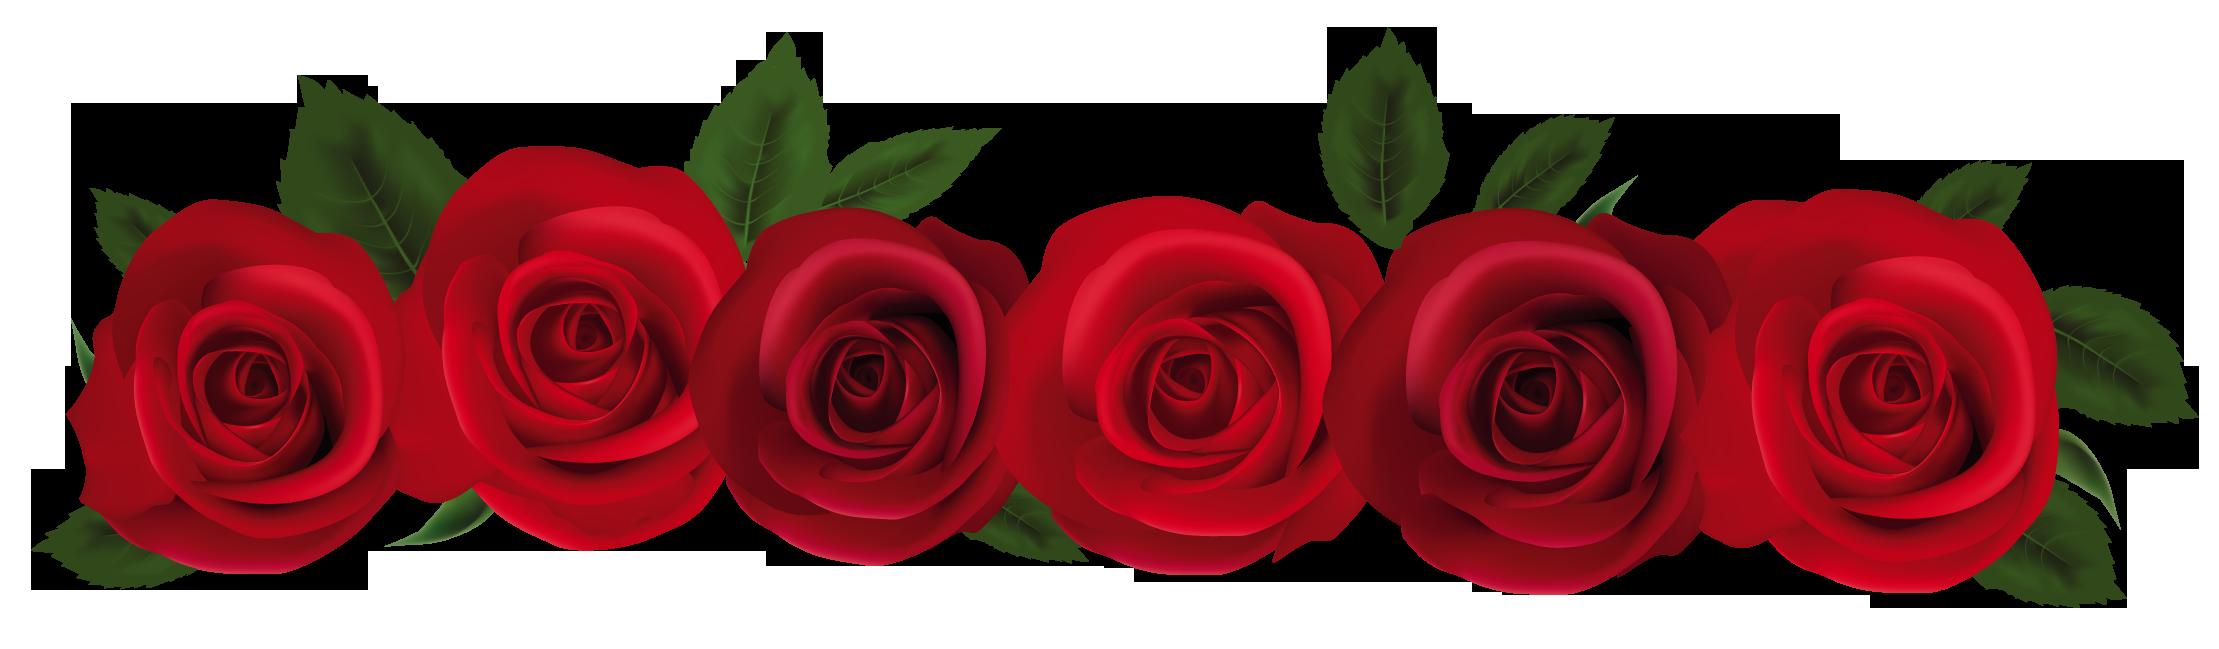 rose border clip art free.